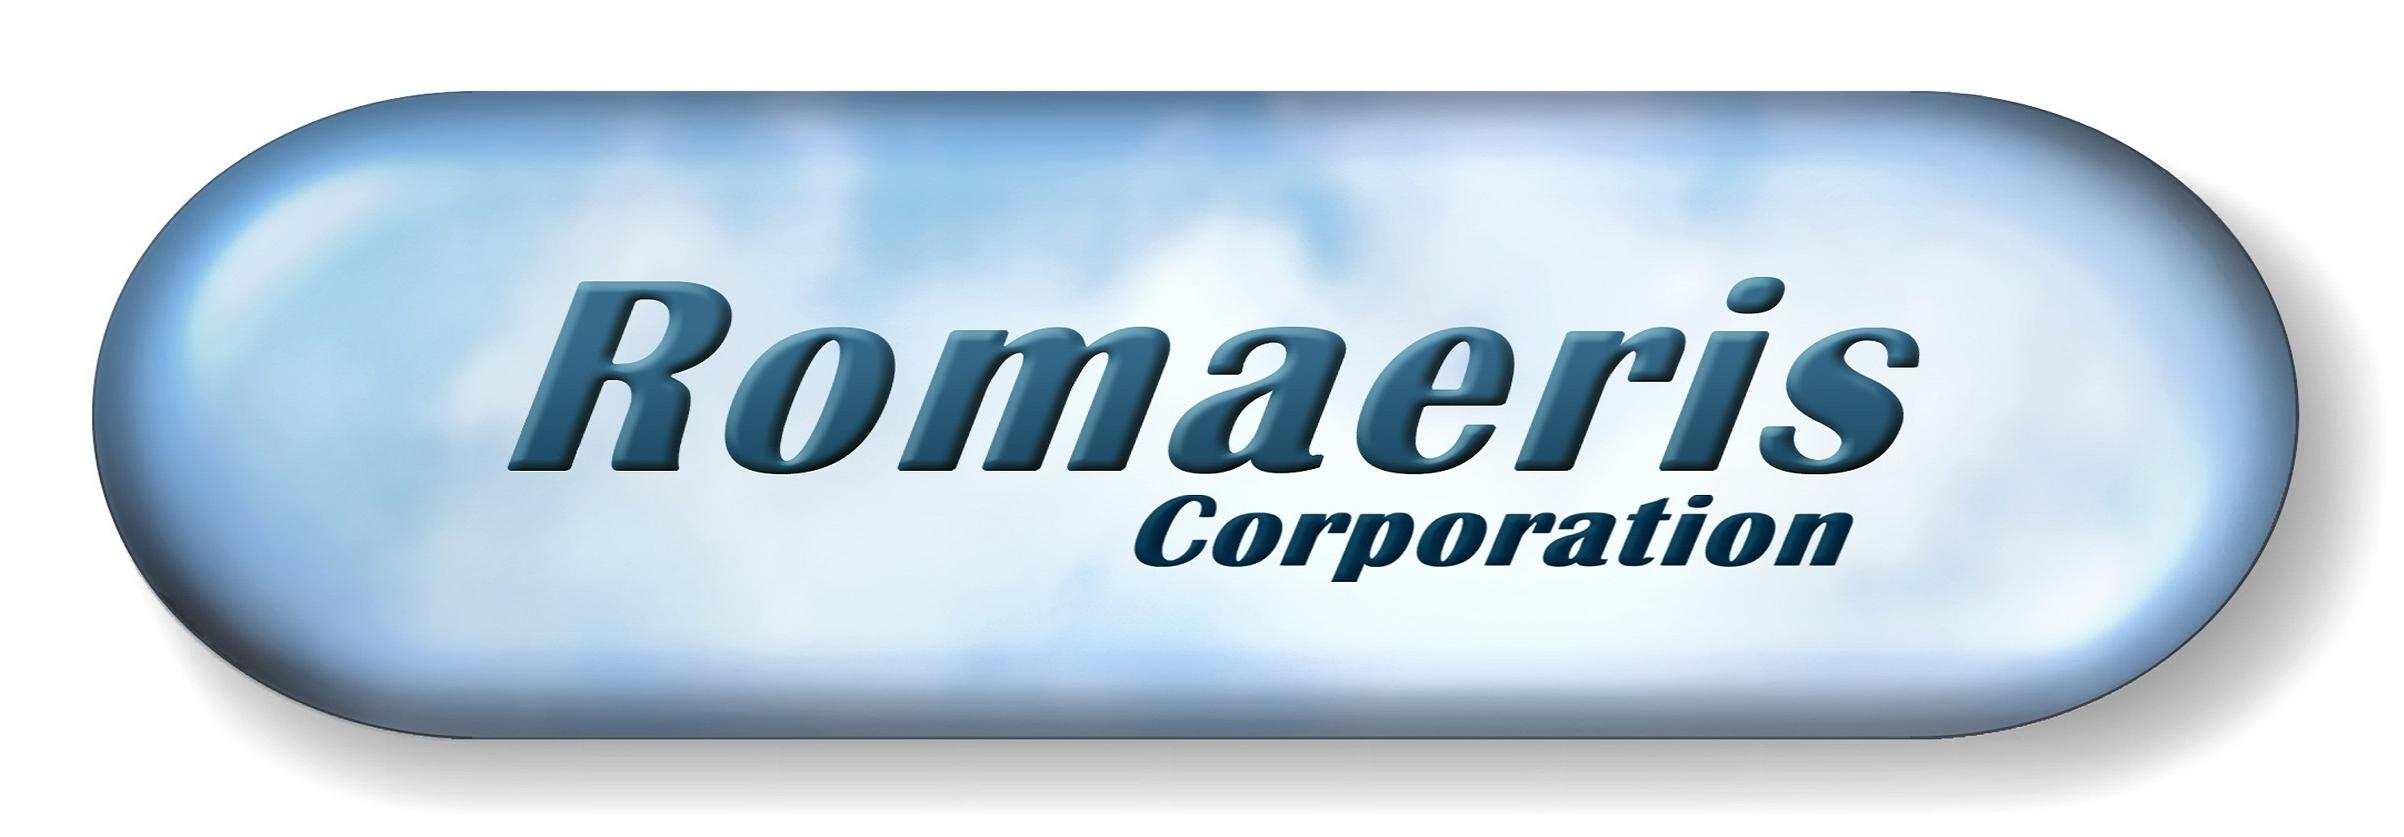 Romaeris Corporation